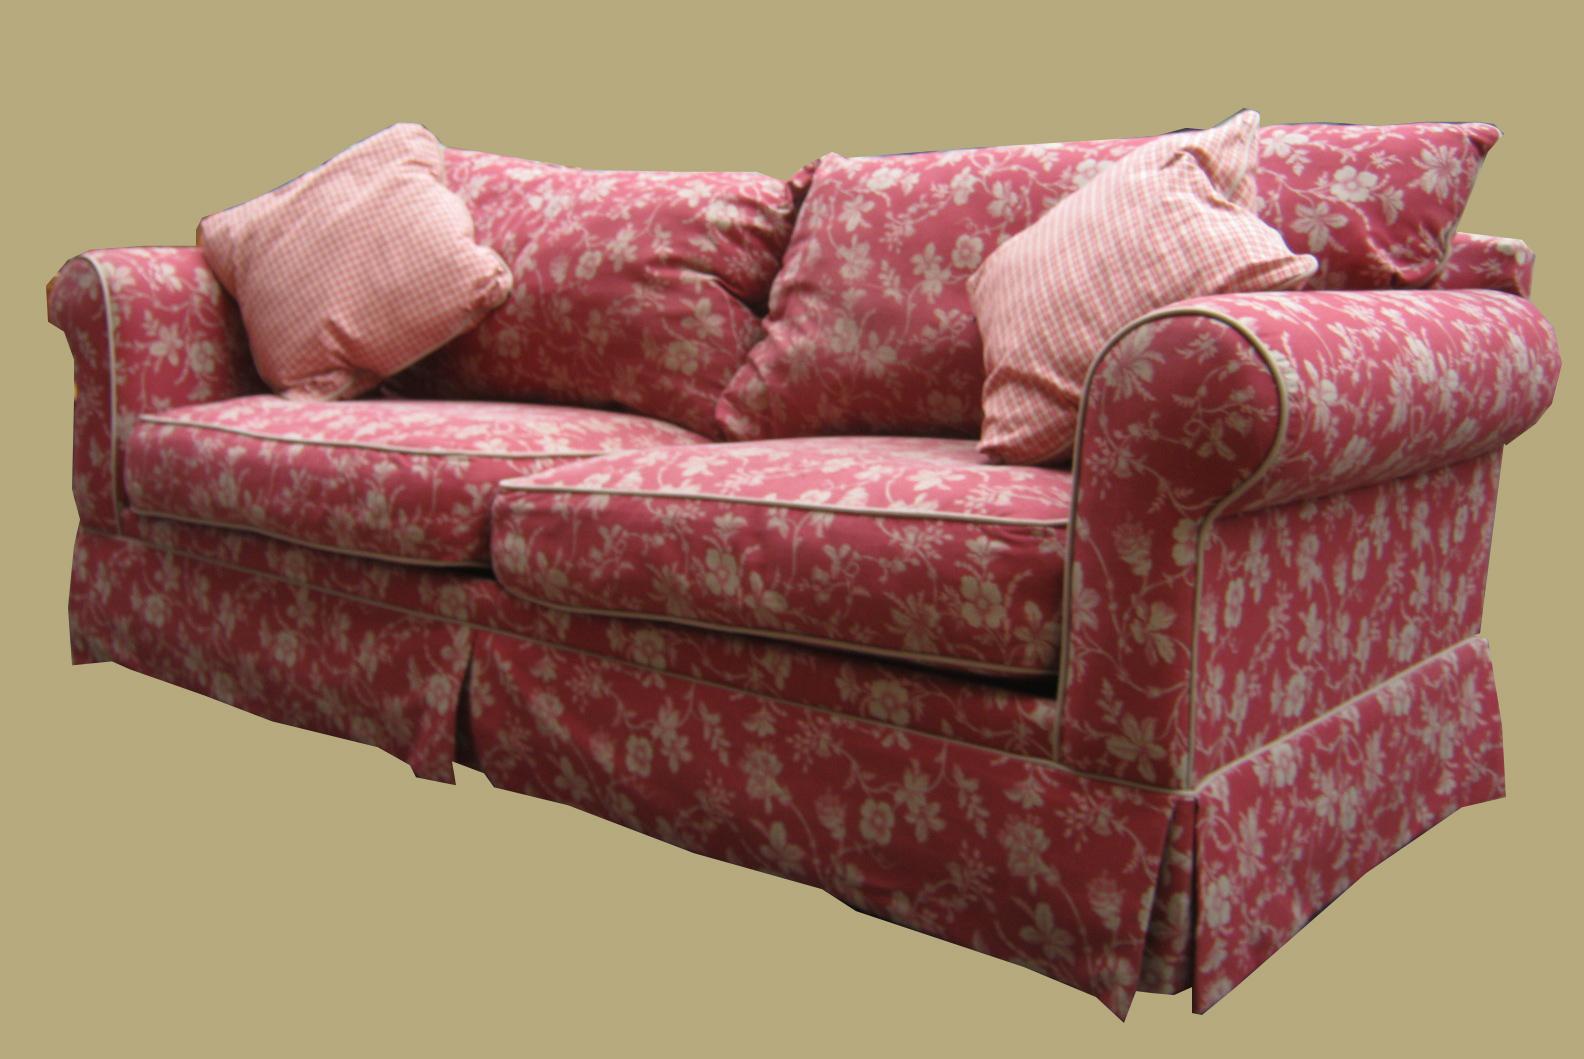 Free Furniture Philadelphia Uhuru Furniture & Collectibles: Klaussner Cottage Country ...